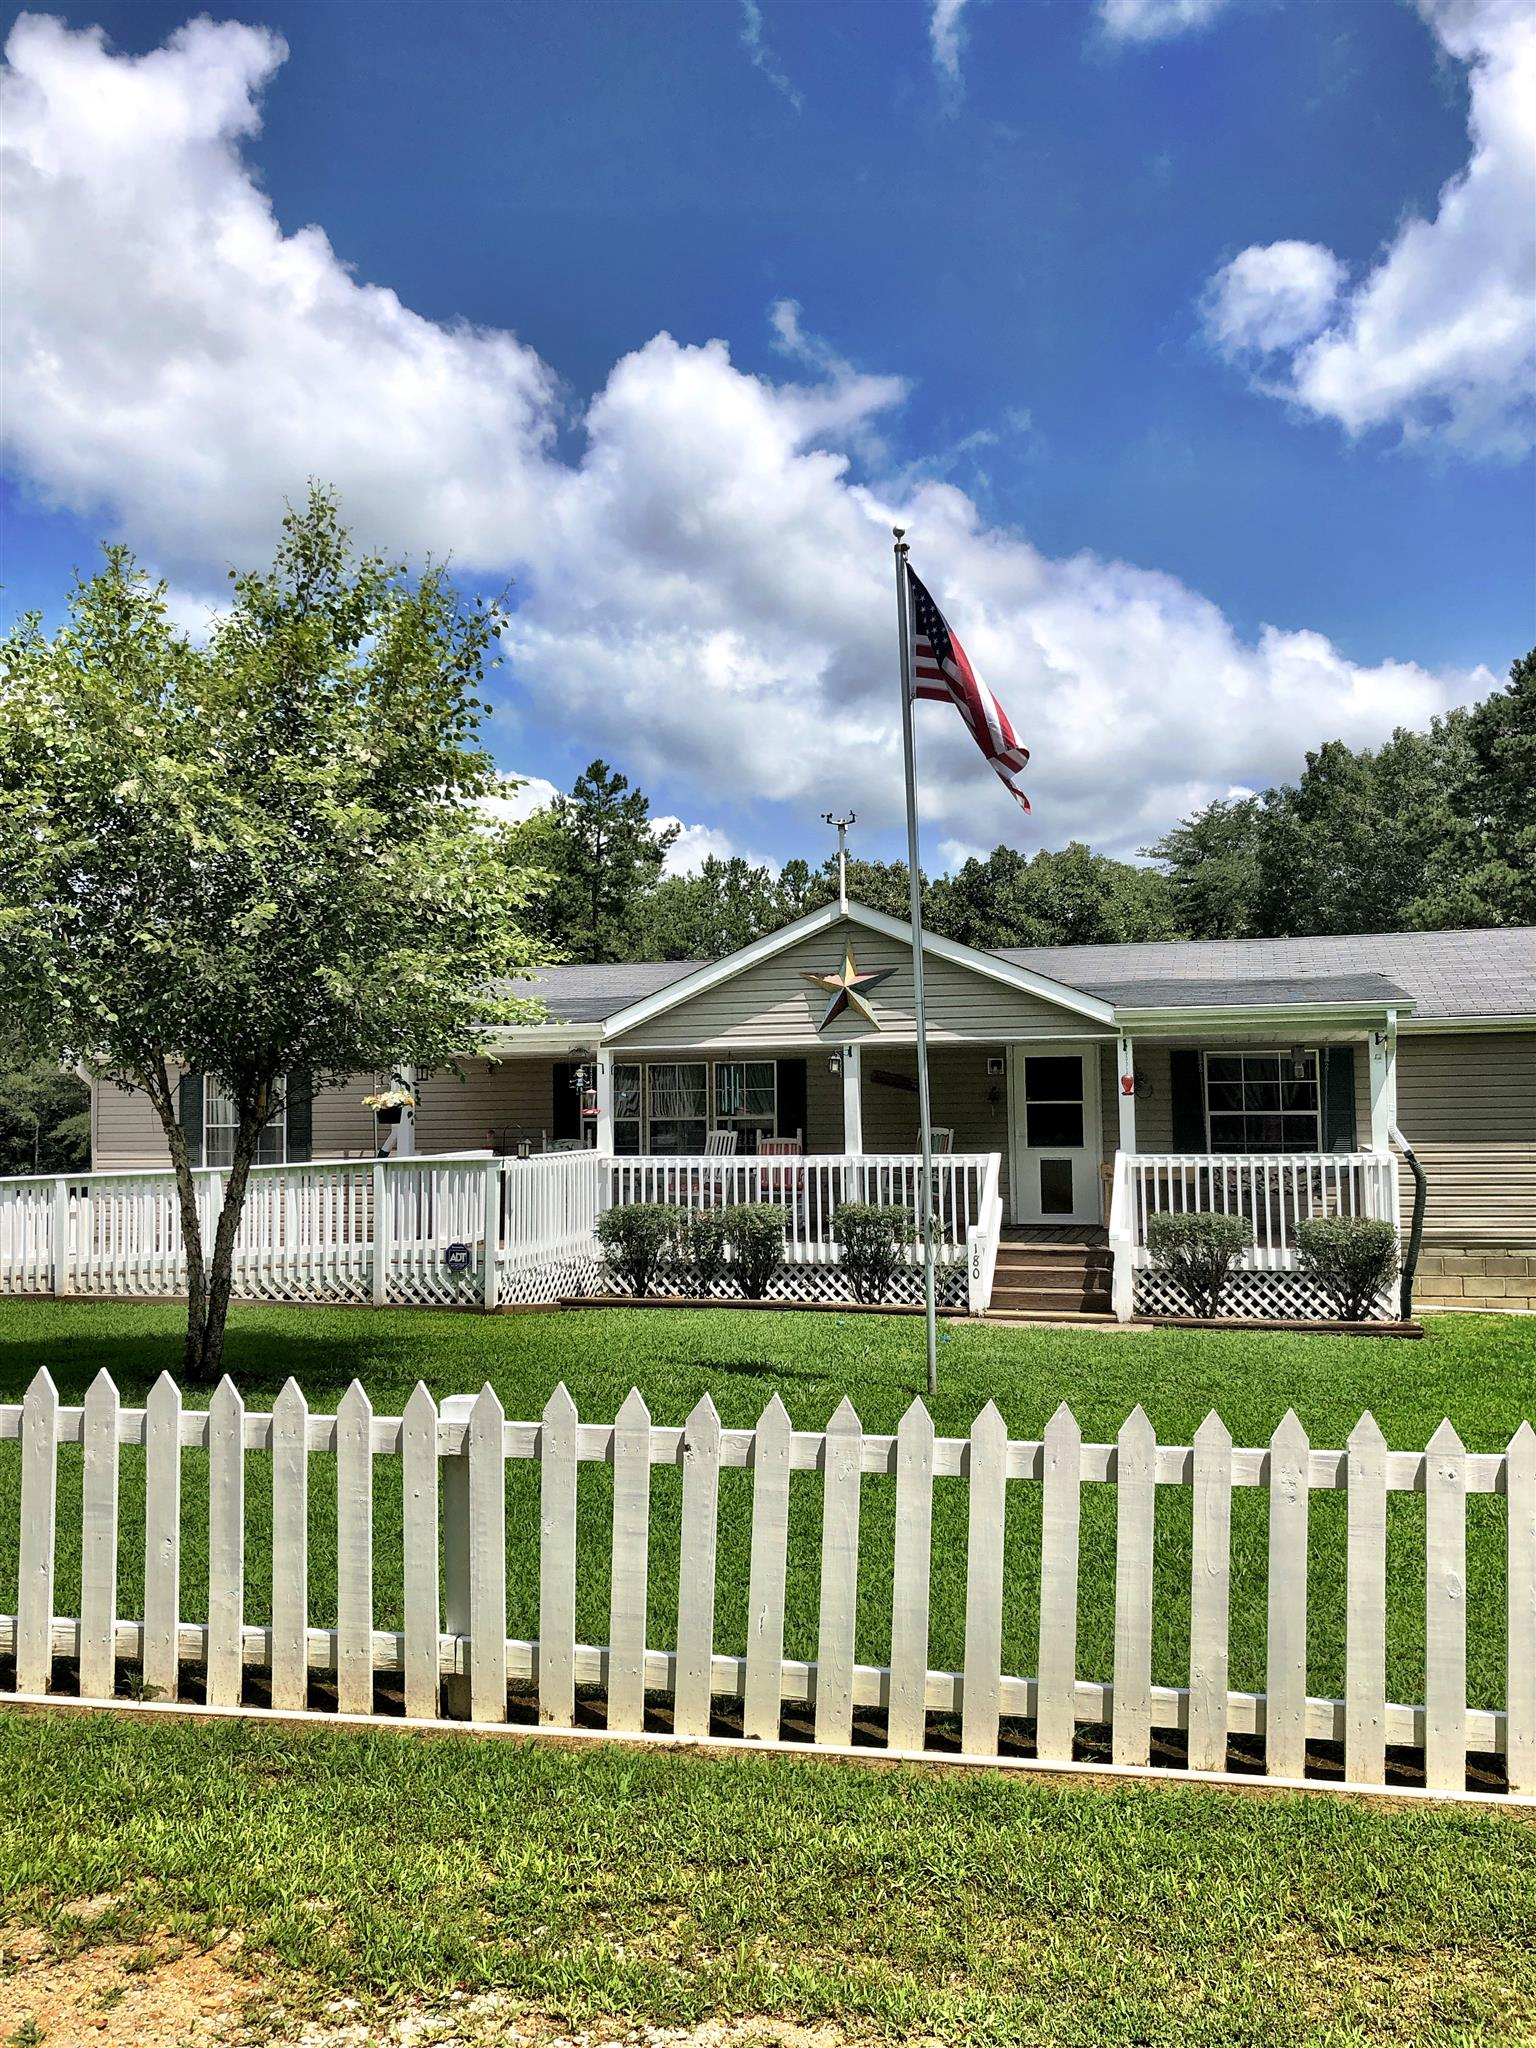 180 Gifford Ln, NE, Hohenwald, TN 38462 - Hohenwald, TN real estate listing